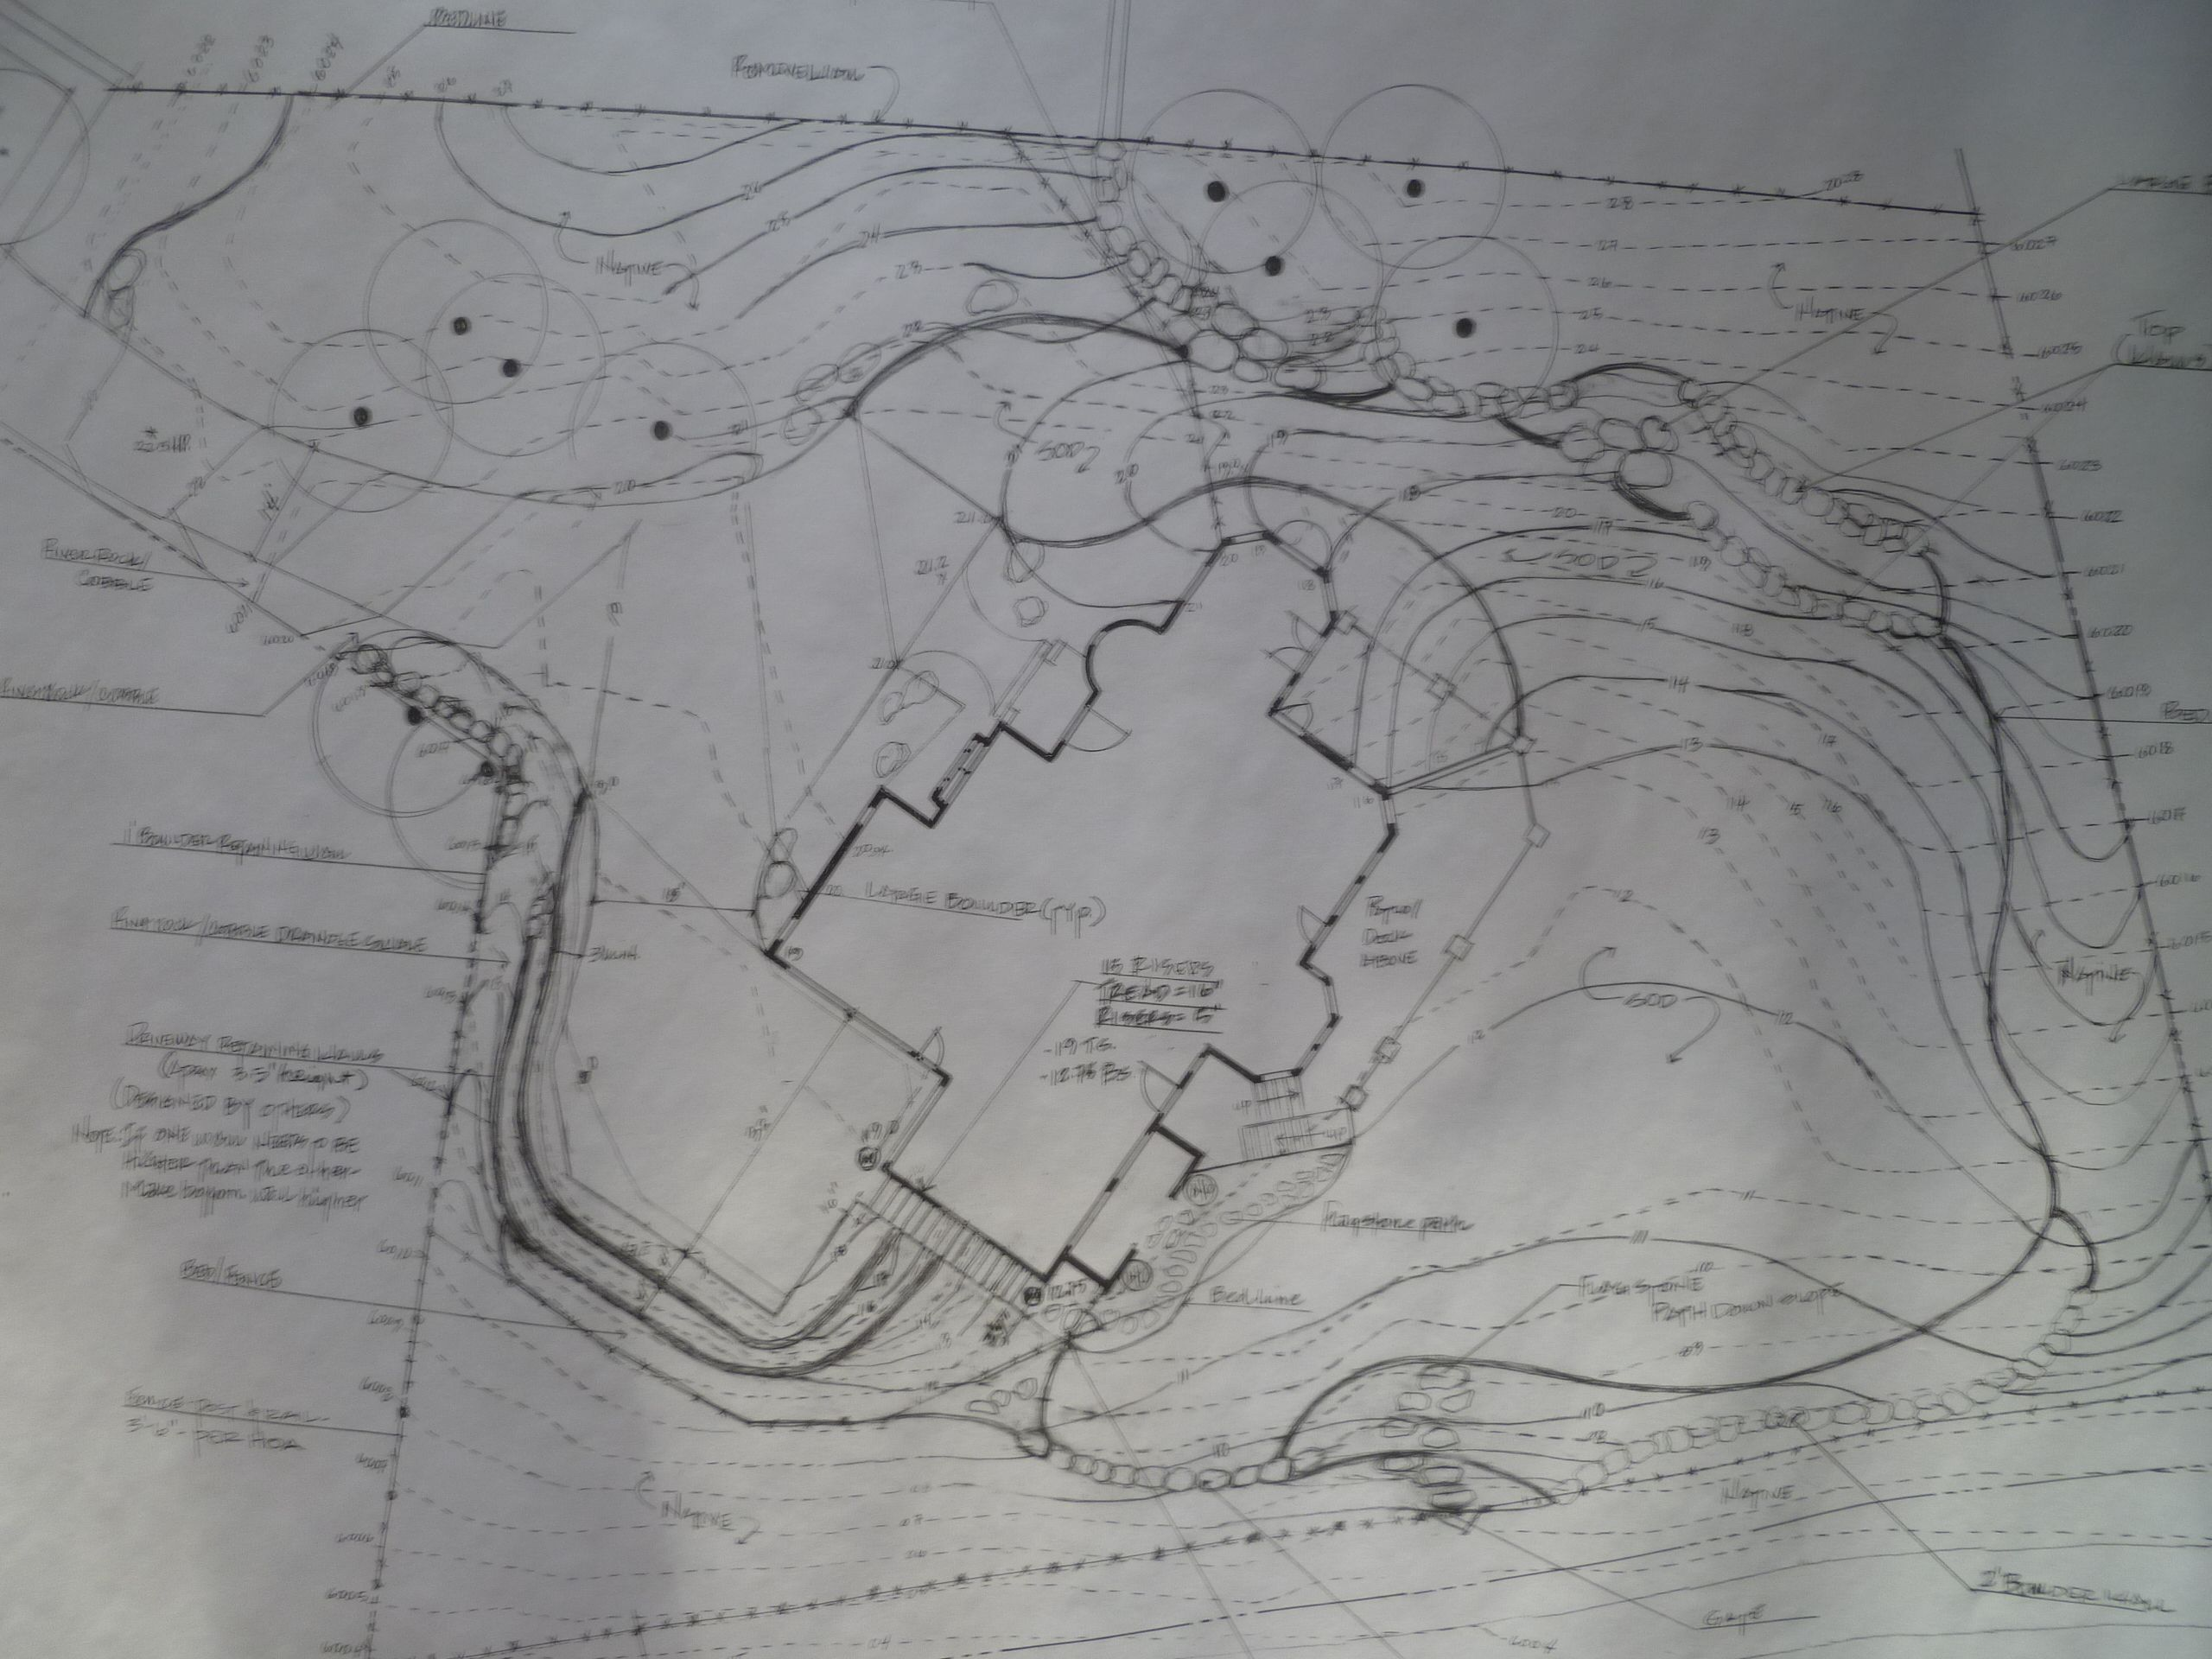 grading plan for new home